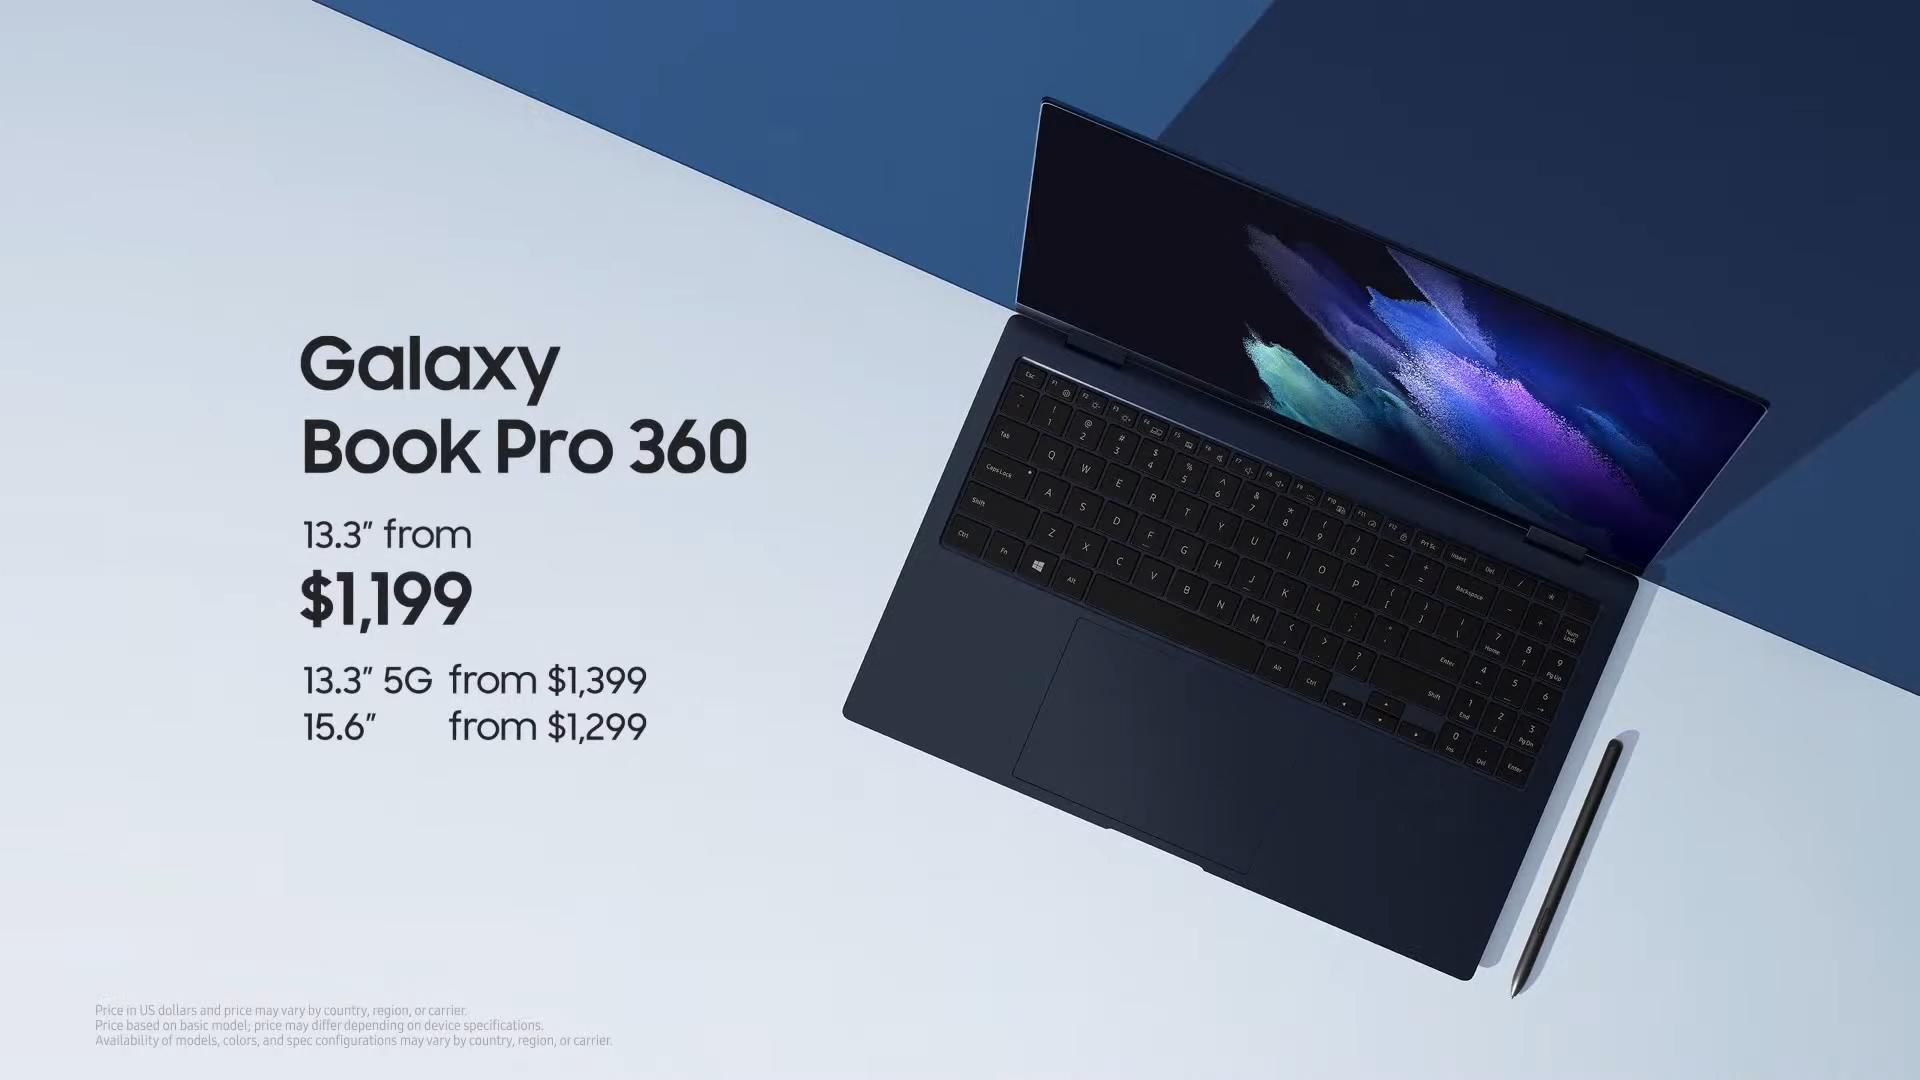 Galaxy Book Pro 360 Price